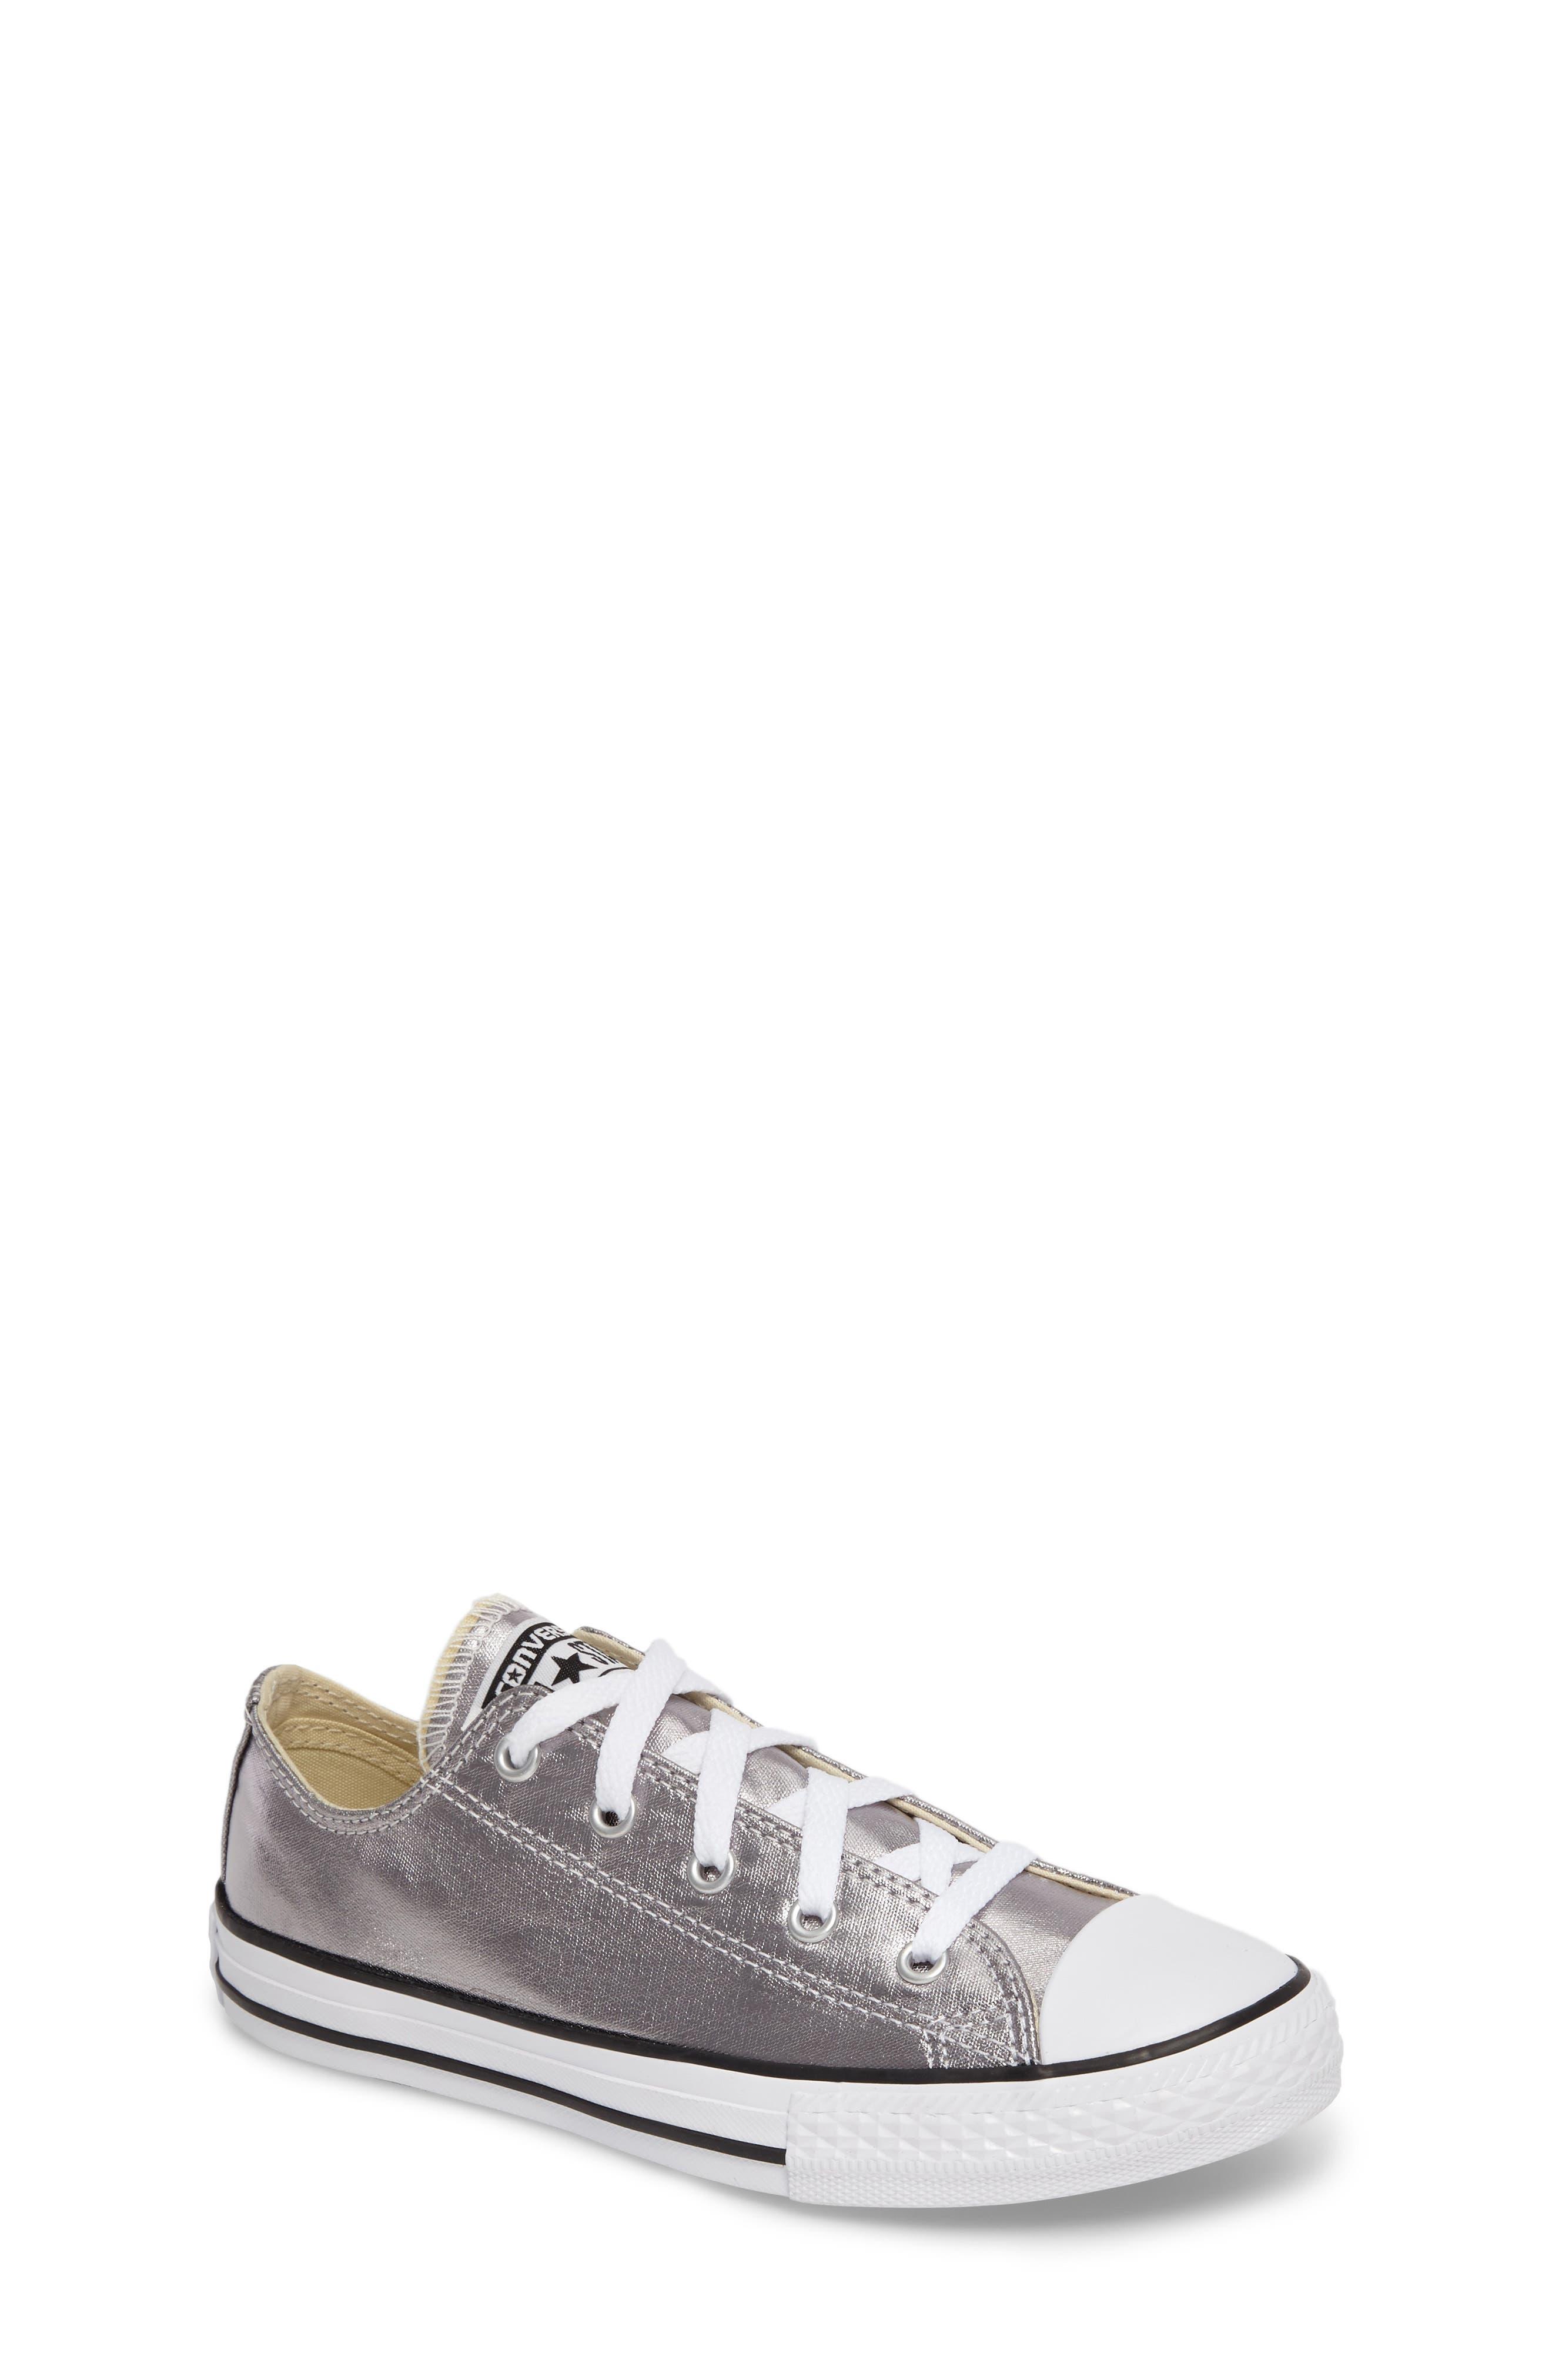 Chuck Taylor<sup>®</sup> All Star<sup>®</sup> Metallic Sneaker,                             Main thumbnail 1, color,                             040